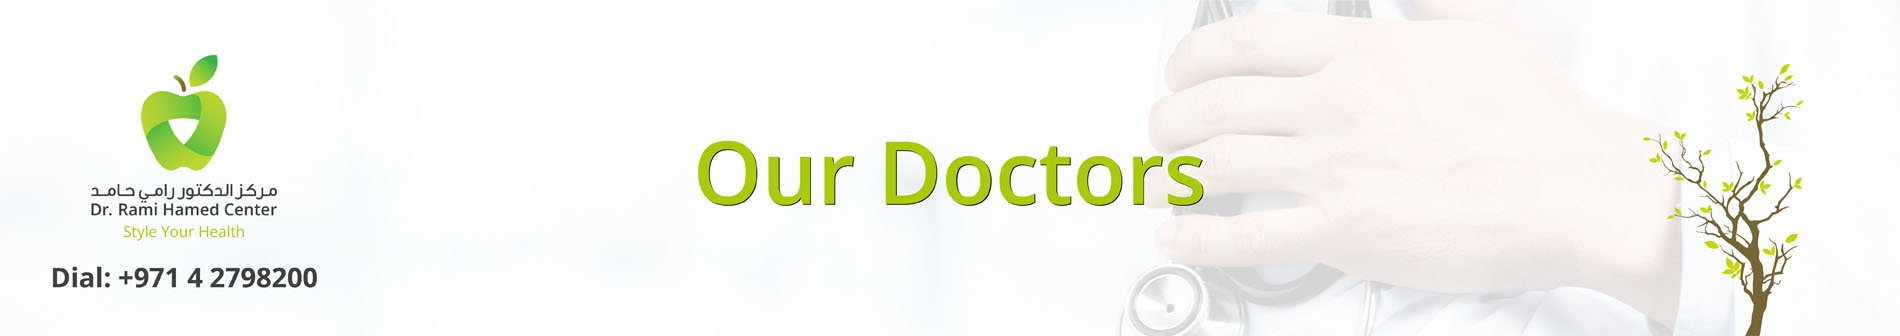 Advanced Laparoscopy and Bariatric Surgery